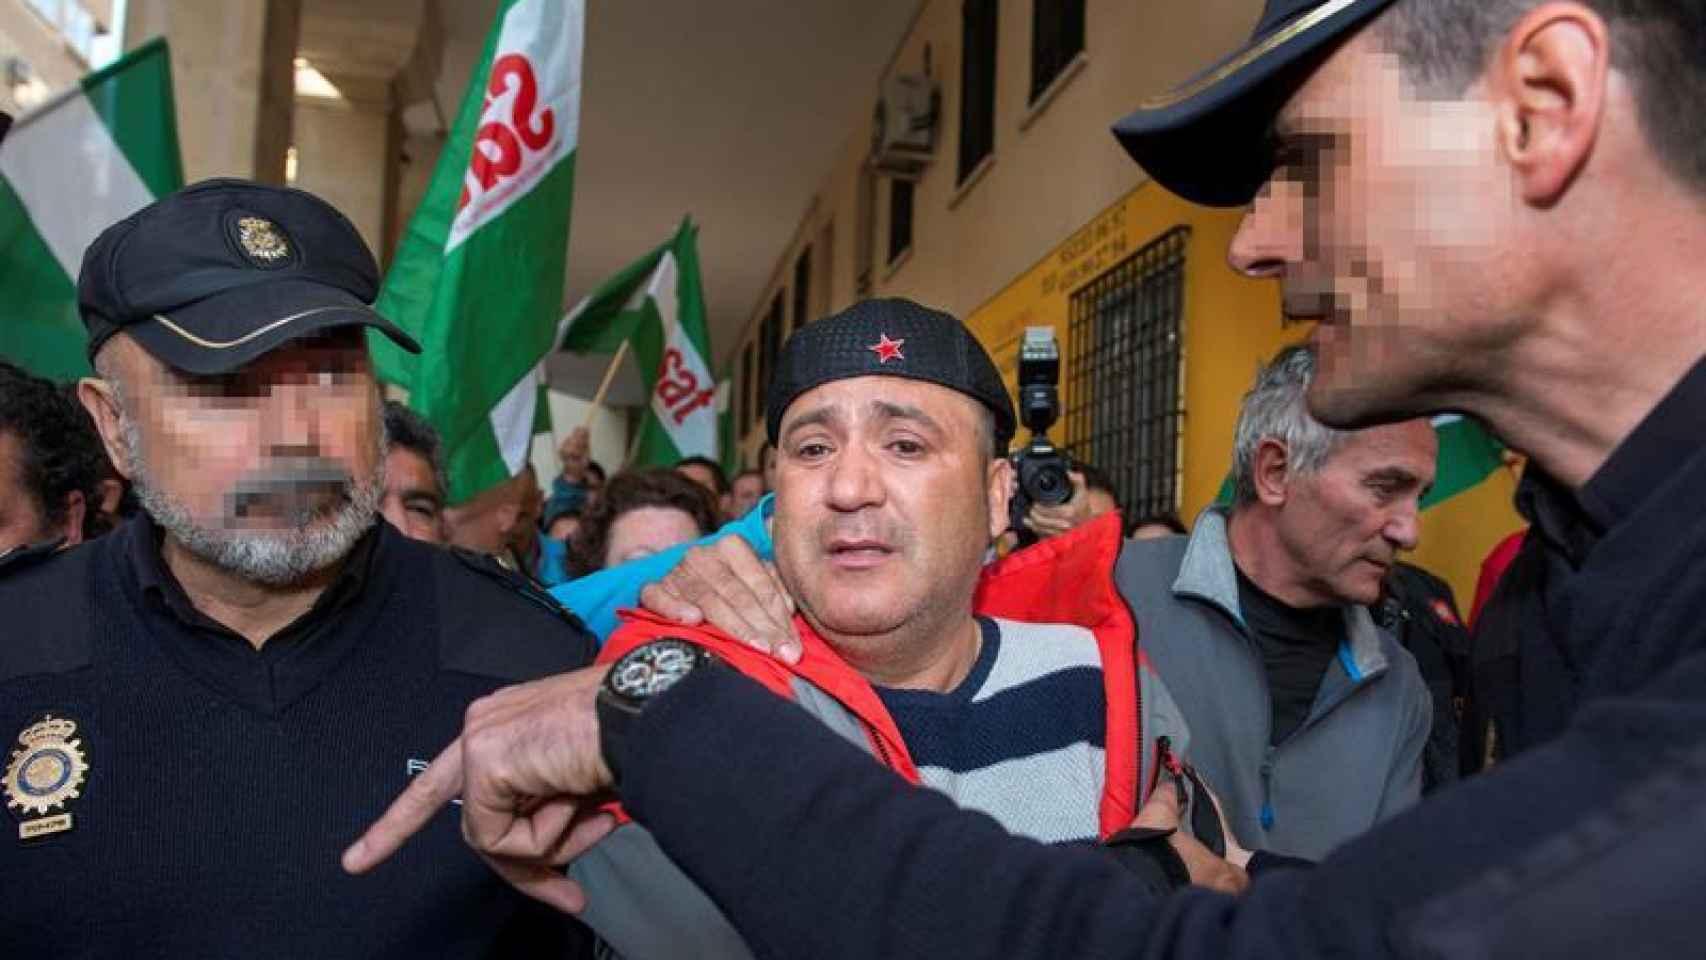 El edil de Jaén en Común Andrés Bódalo, detenido este miércoles.